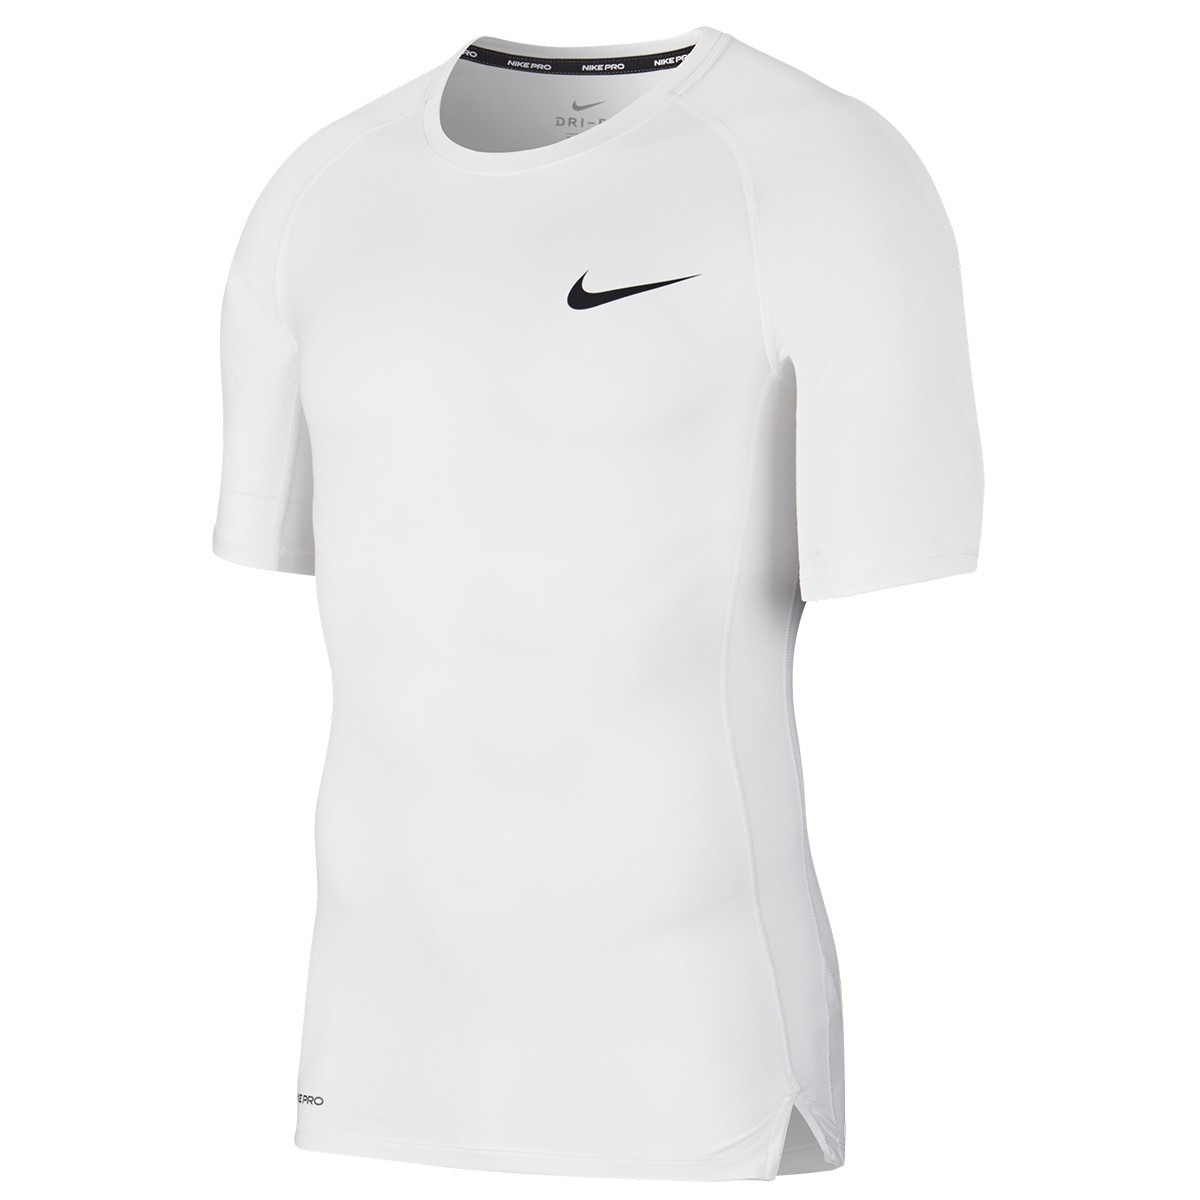 Camiseta Nike Pro Men's Short-Sleeve 'White'